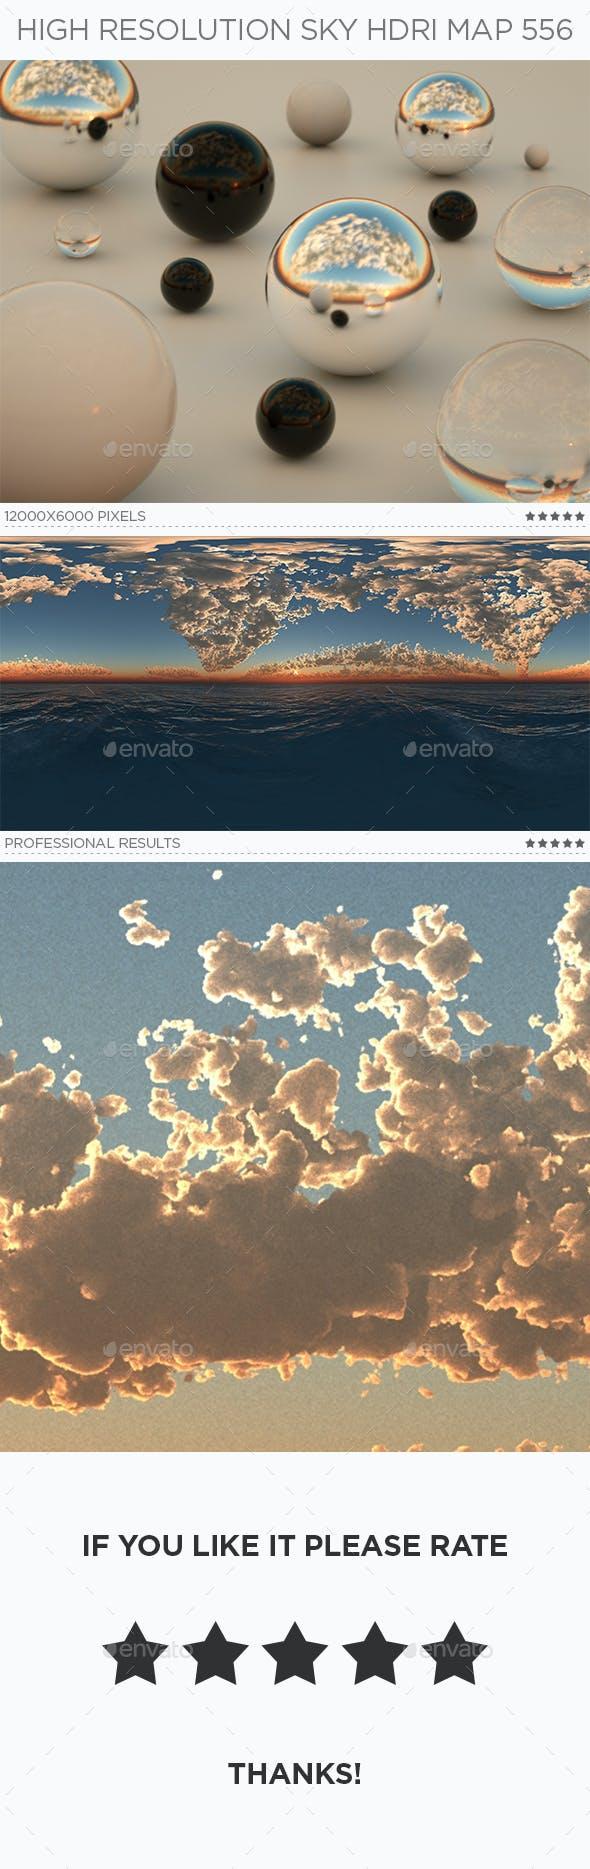 High Resolution Sky HDRi Map 556 - 3DOcean Item for Sale